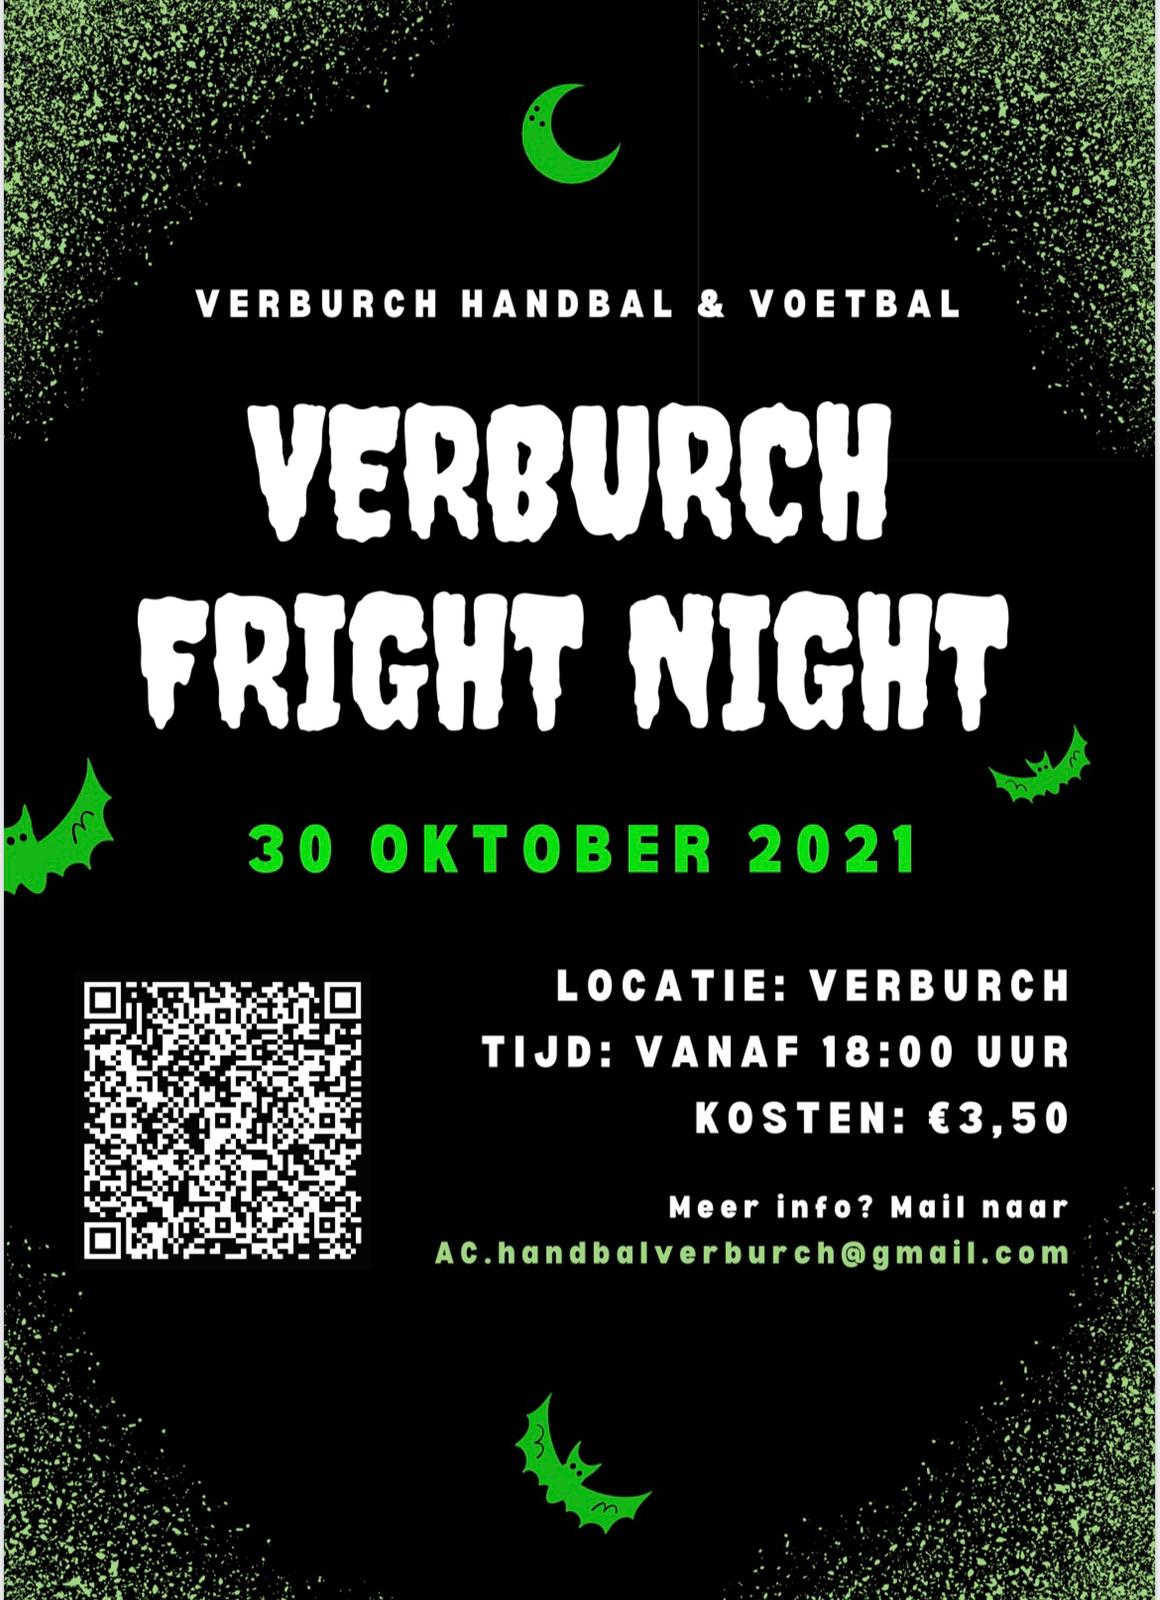 VERBURCH FRIGHT NIGHT 2021